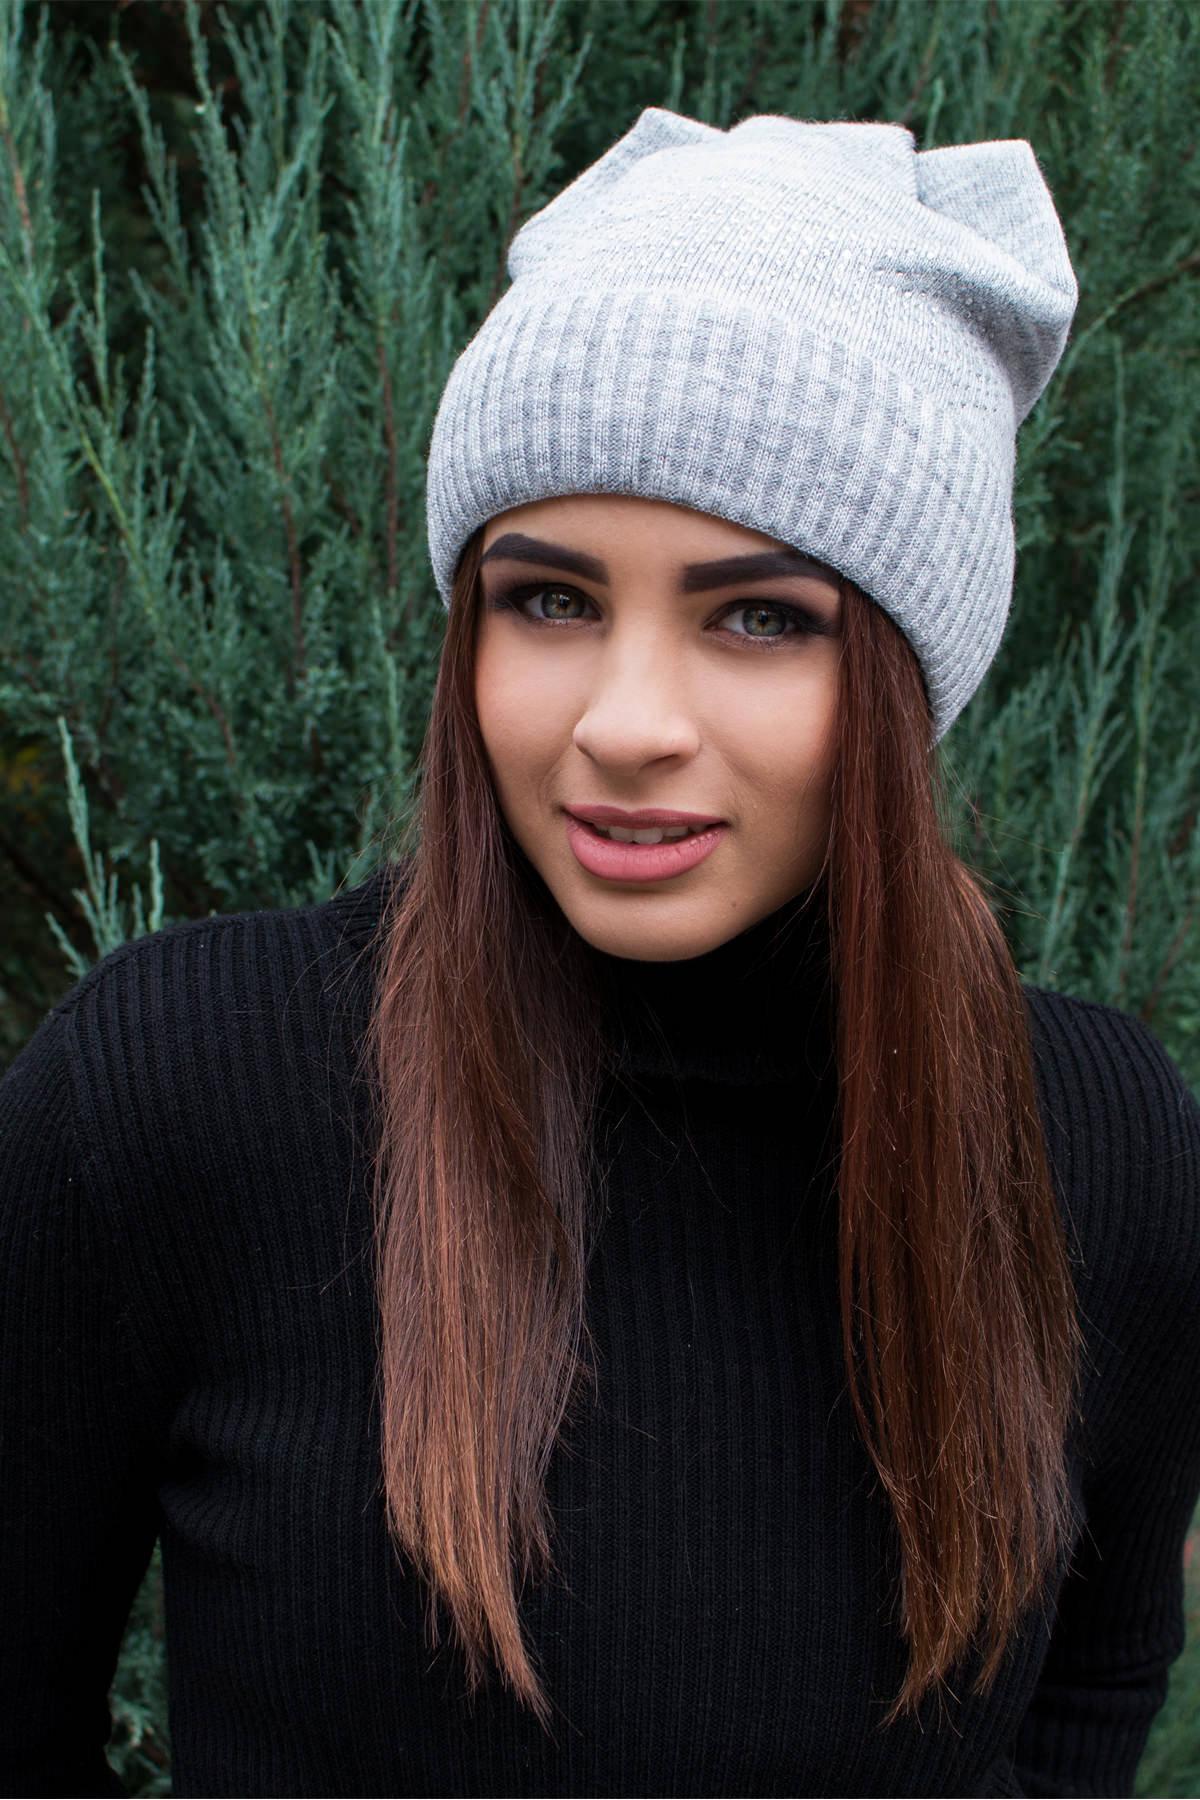 купить оптом женскую шапка Шапка Катюша